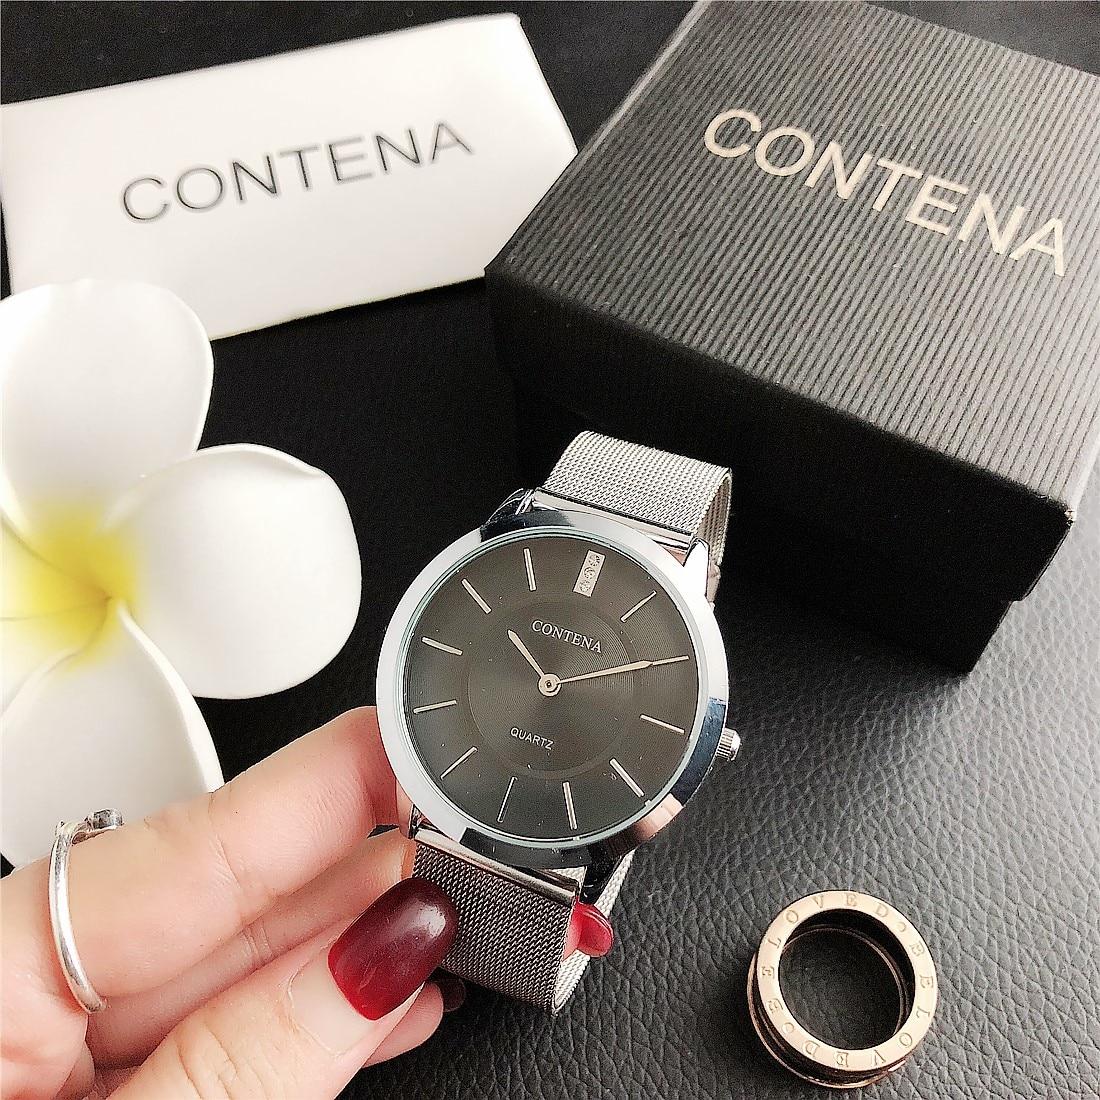 CONTENA Luxury  Nice Quartz Watch 2020 Women Watches  Fashion Ladies Wrist Watch Female Clock Relogio Feminino Montre Femme